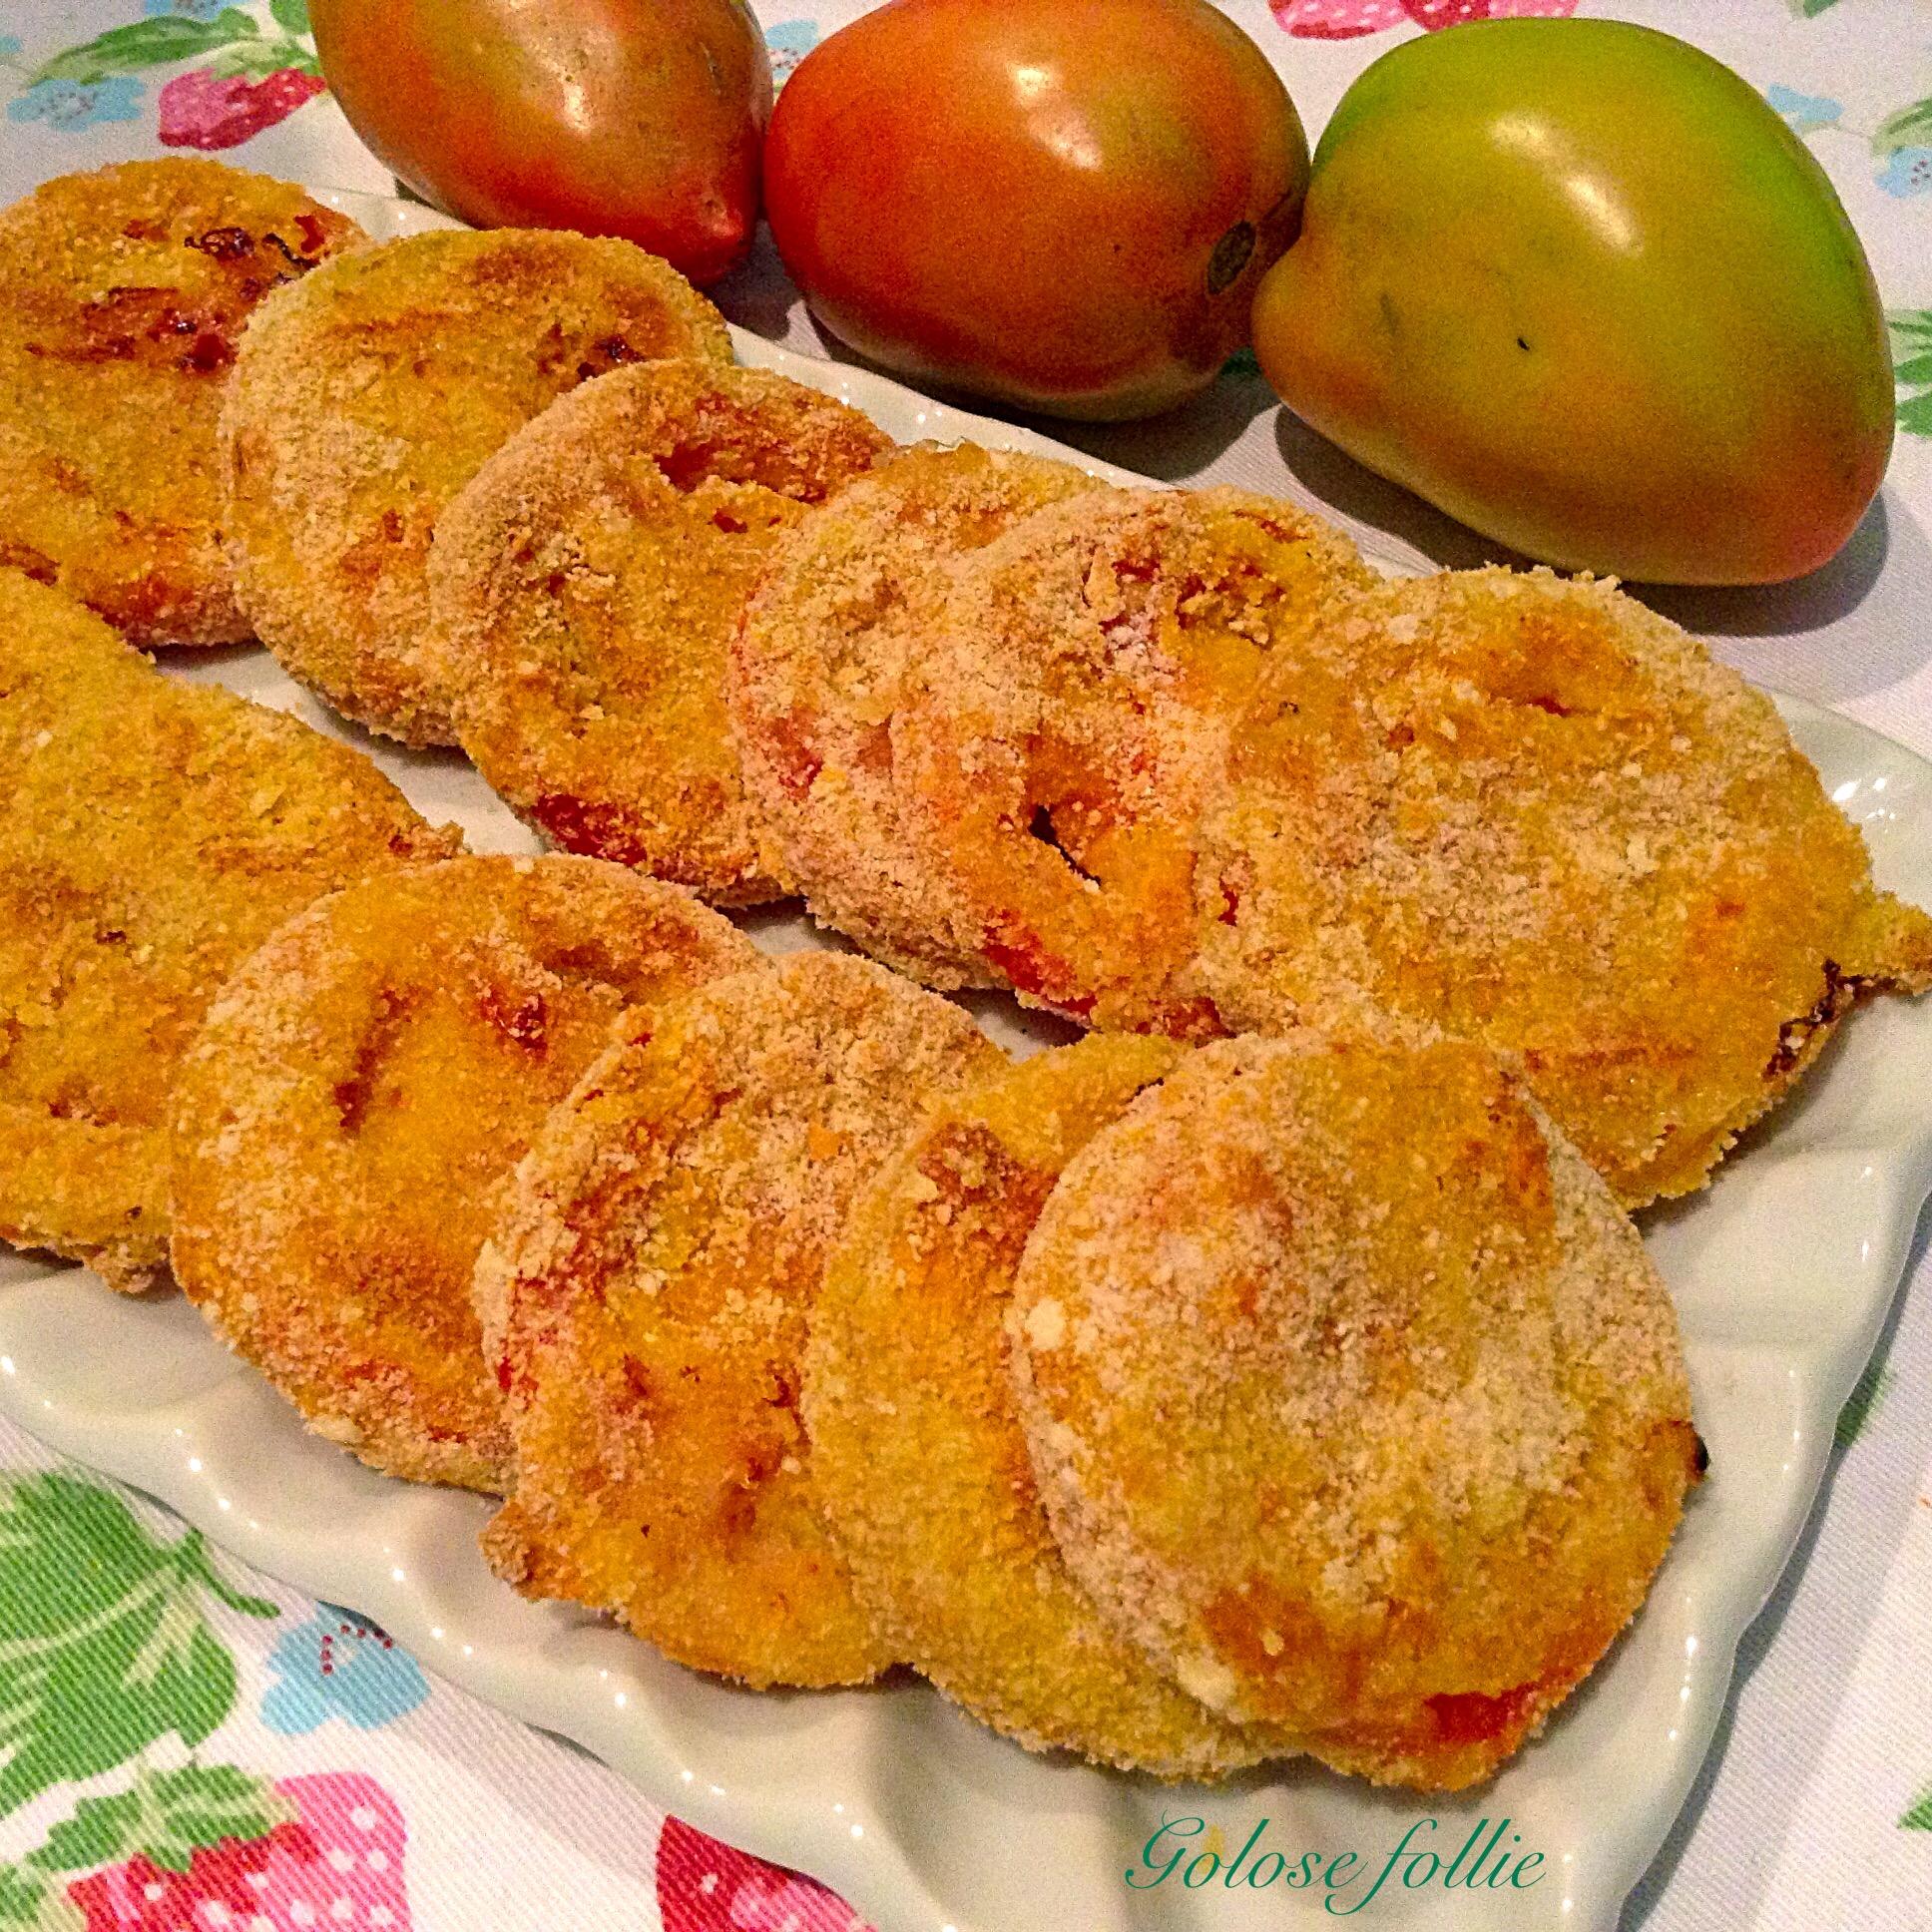 Pomodori verdi al forno | Golose follie